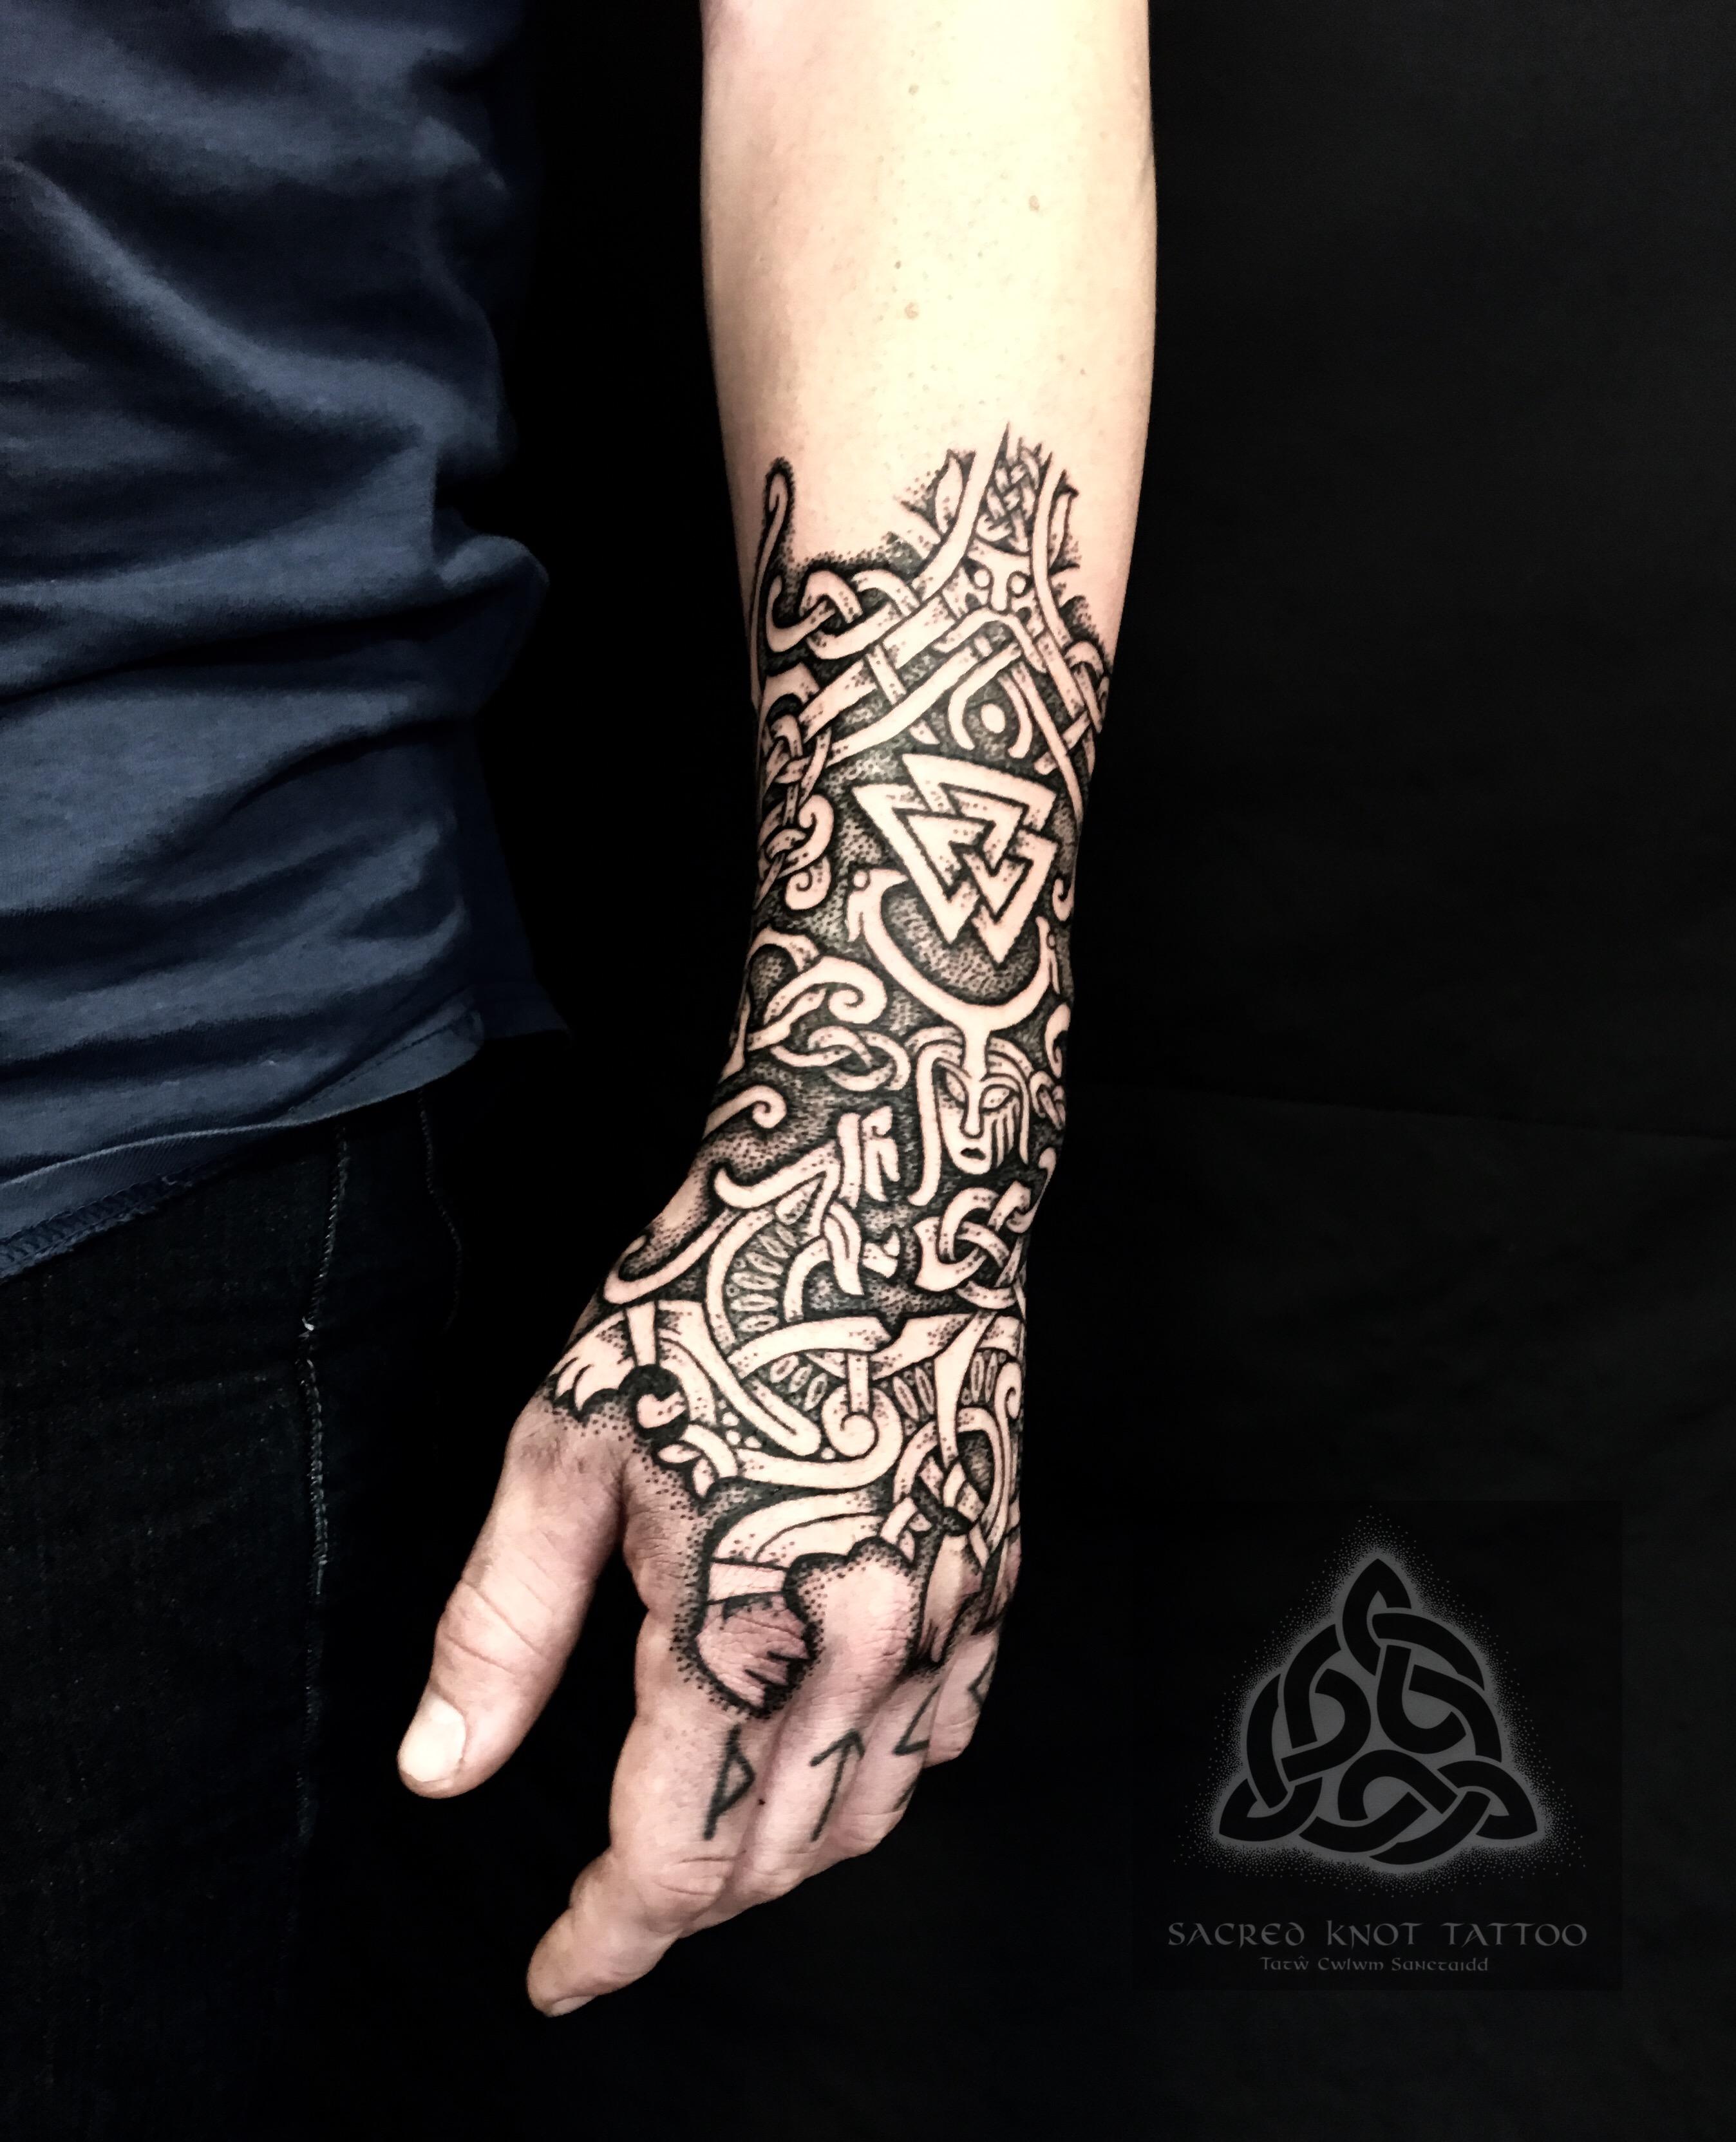 Gauntlet Tattoo, viking tattoo nordic sacred knot